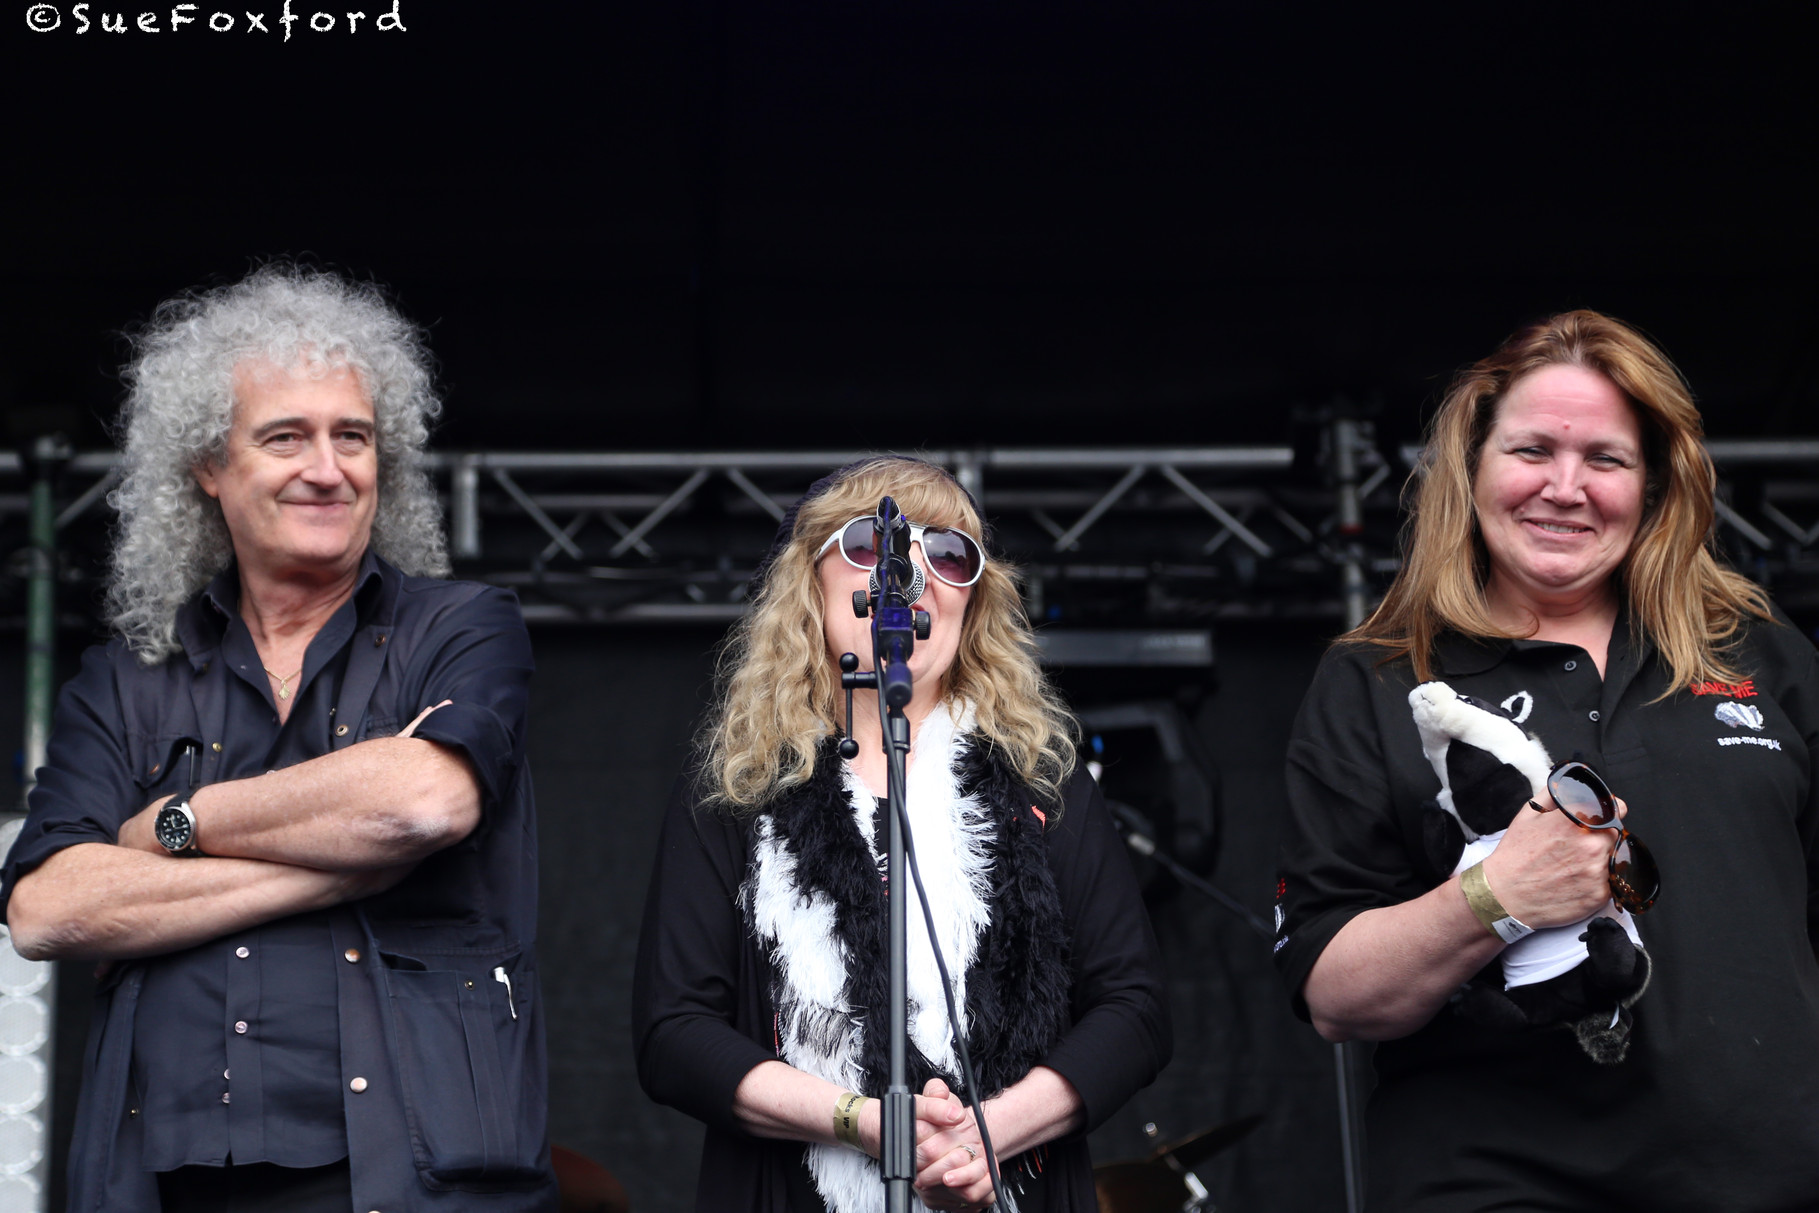 Brian May, Shirley Higton, Anne Brummer  - @SueFoxford